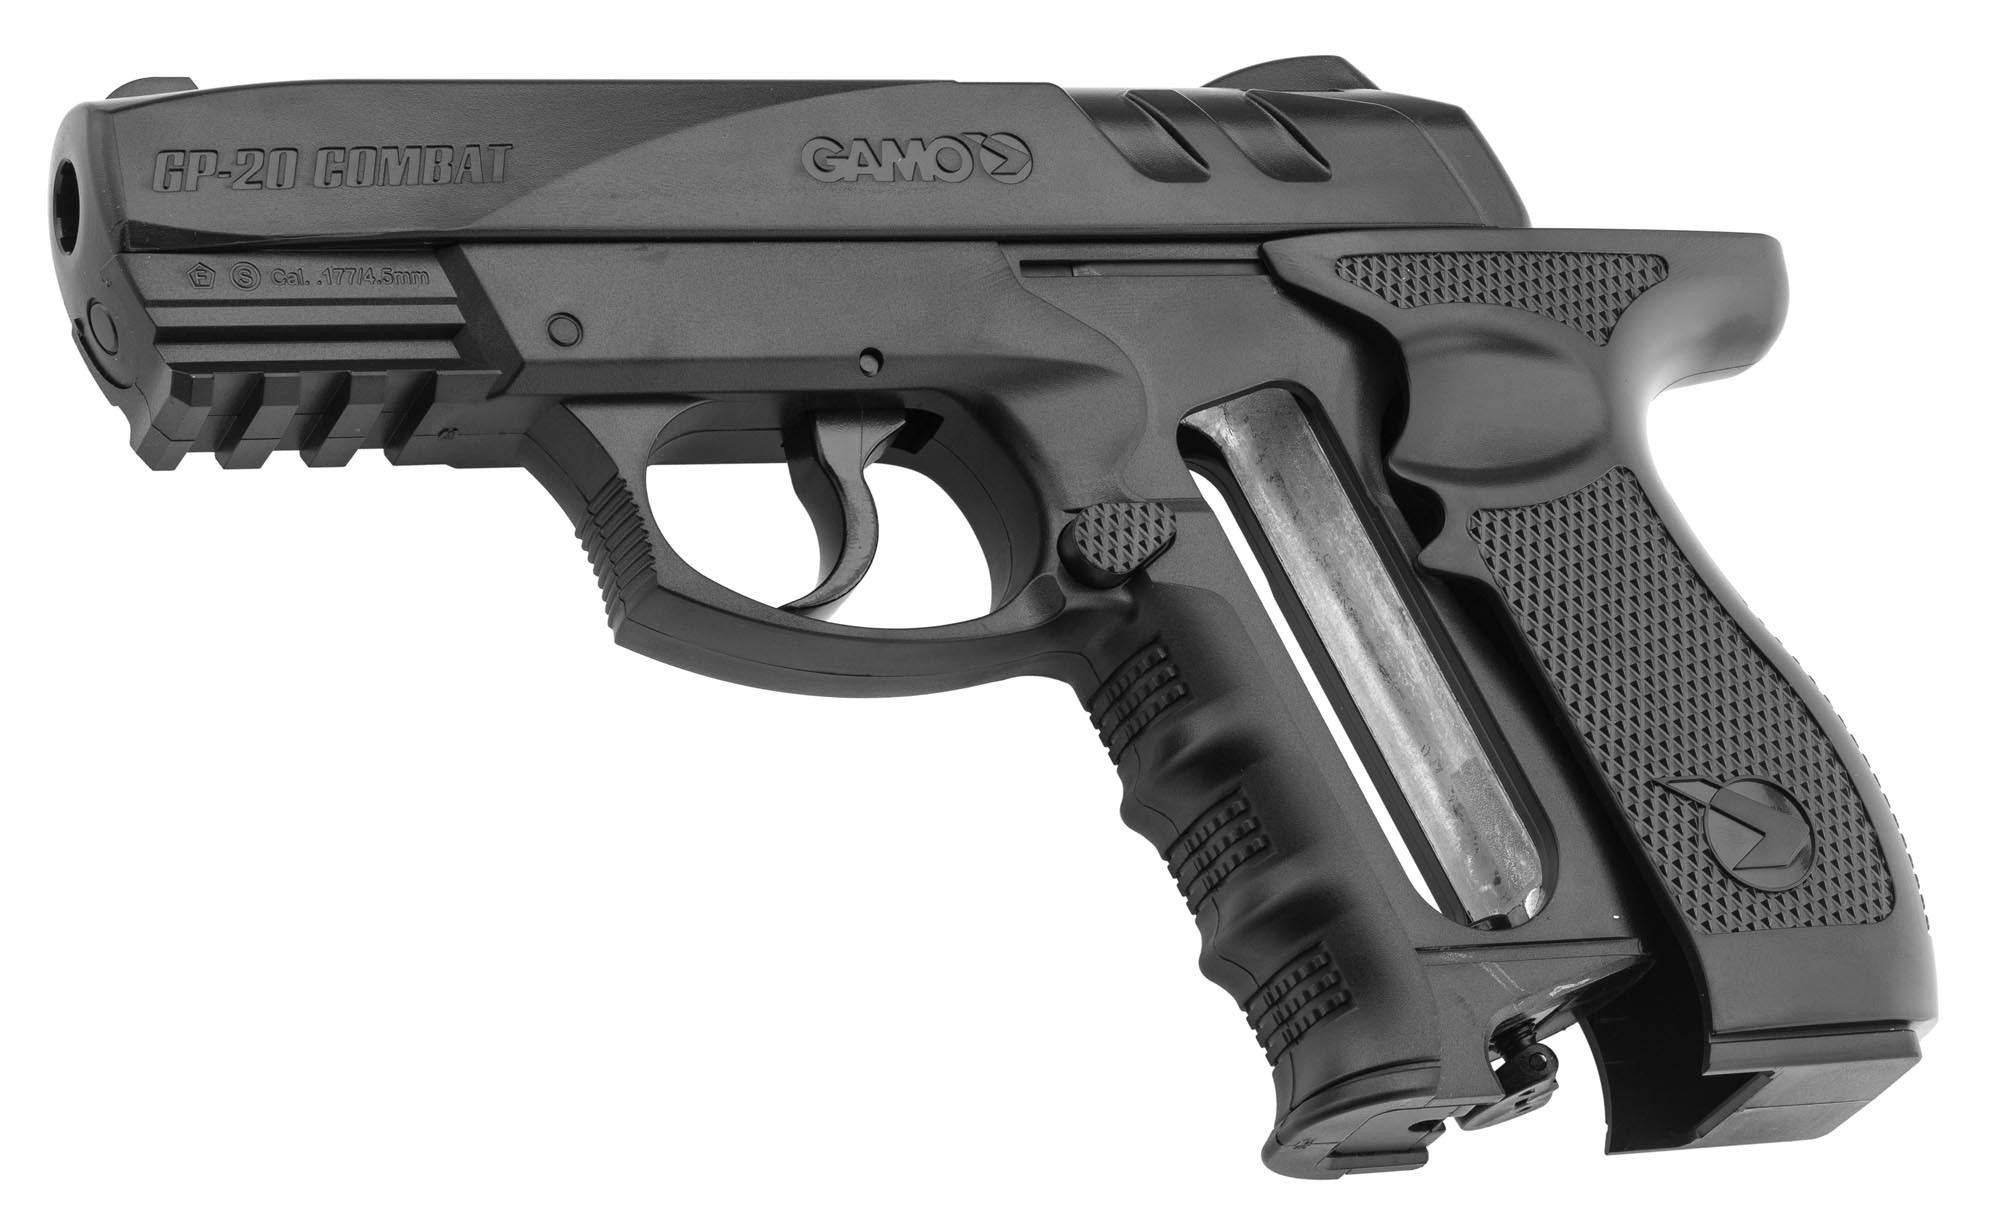 pistolet co2 gamo gp 20 cal 4 5 mm pistolets air comprim co2 made in chasse. Black Bedroom Furniture Sets. Home Design Ideas